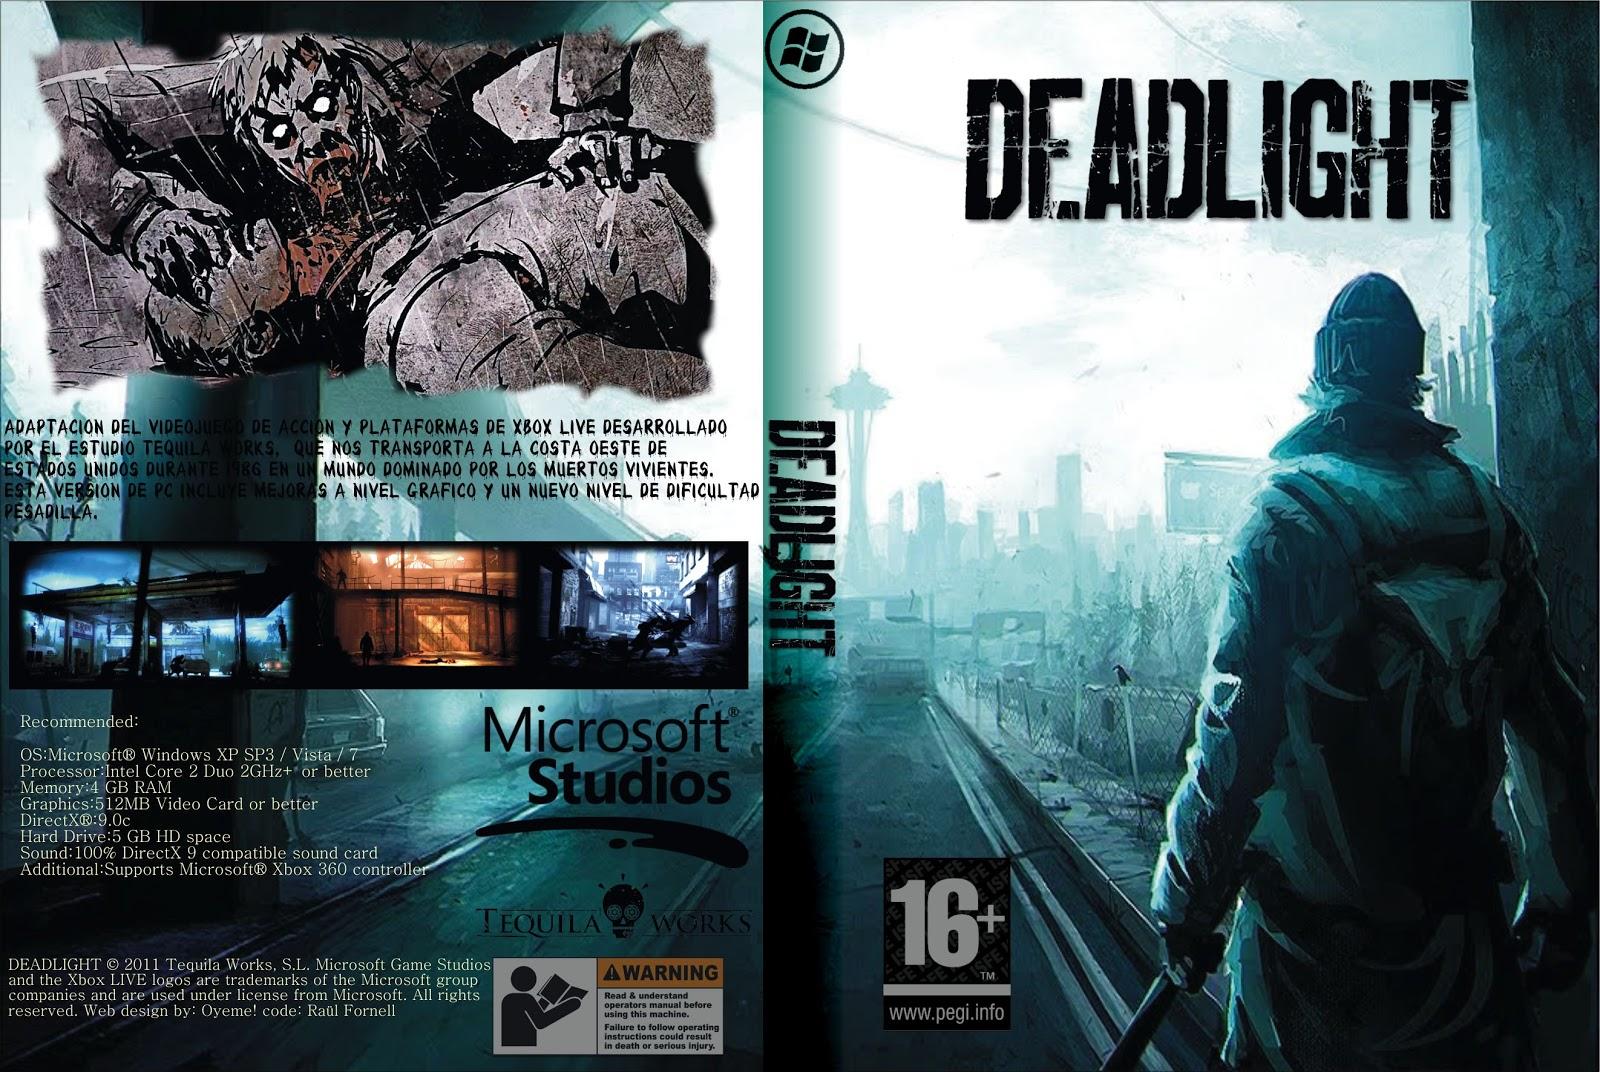 http://1.bp.blogspot.com/-axnU9cBrVjg/UI3Sx91rS-I/AAAAAAAAWQM/HLSWVfx51Dc/s1600/48774-deadlight-cover-box-full.jpg